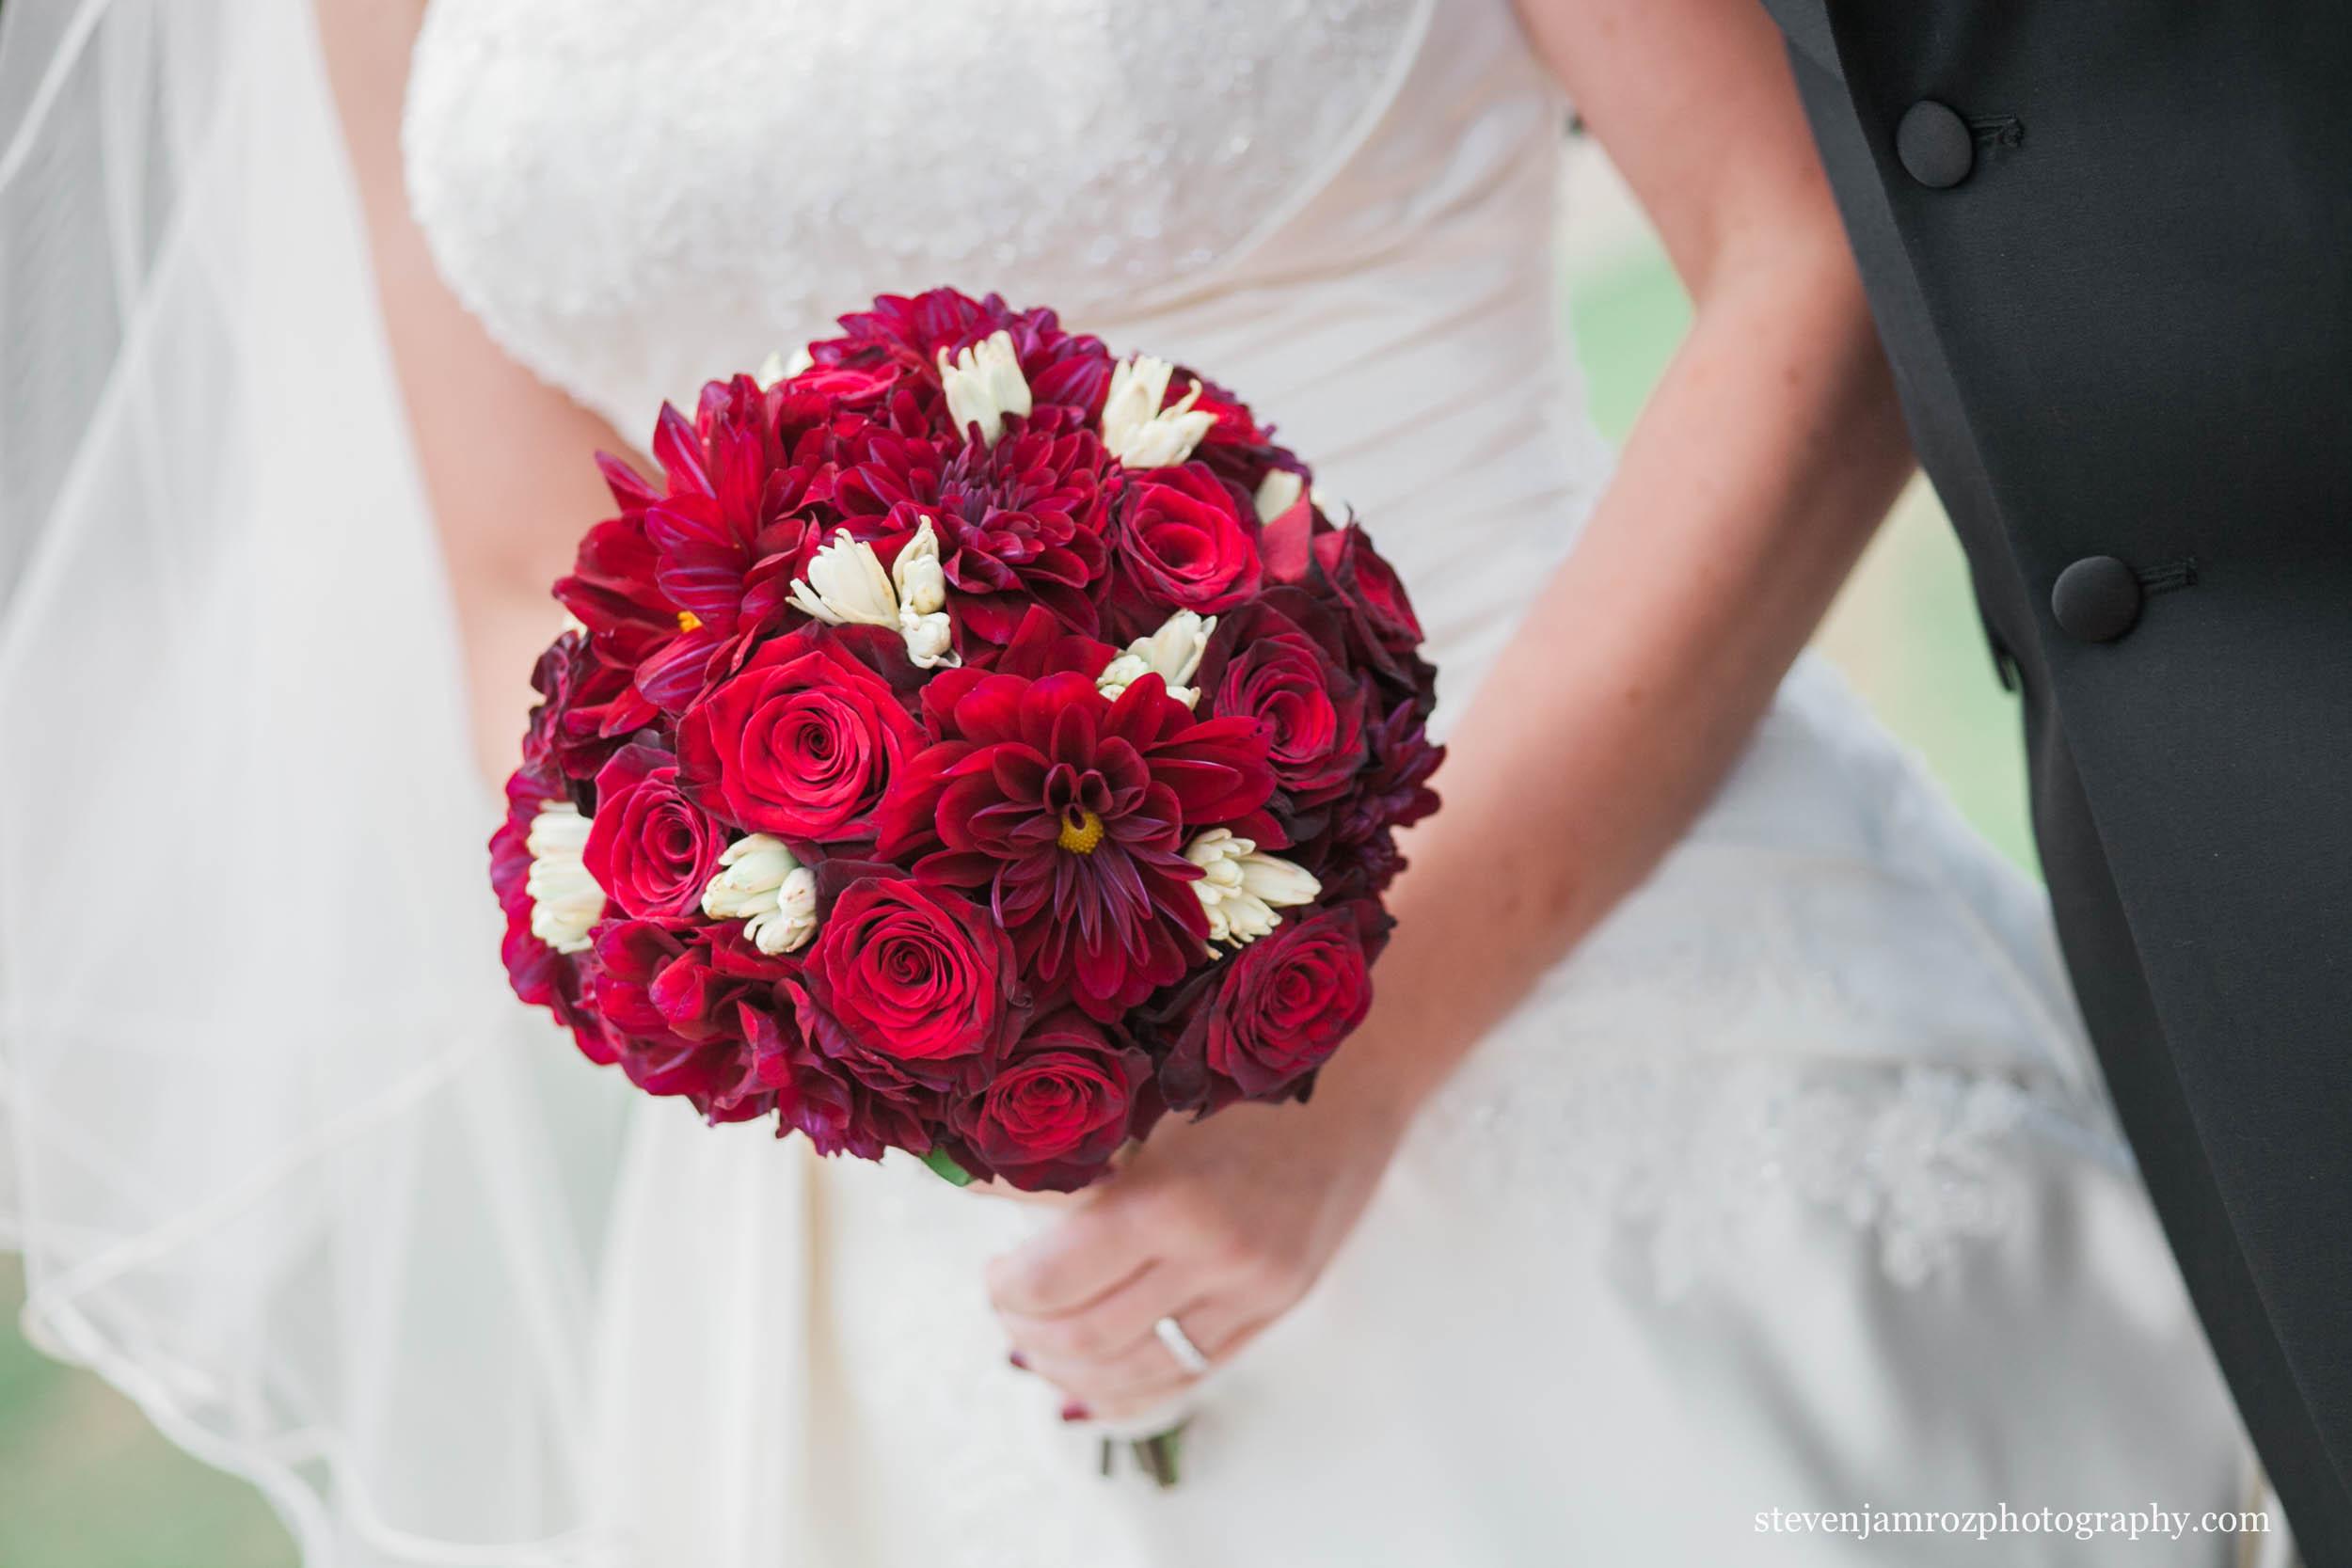 bouquet-red-wedding-flowers-steven-jamroz-photography-0159.jpg